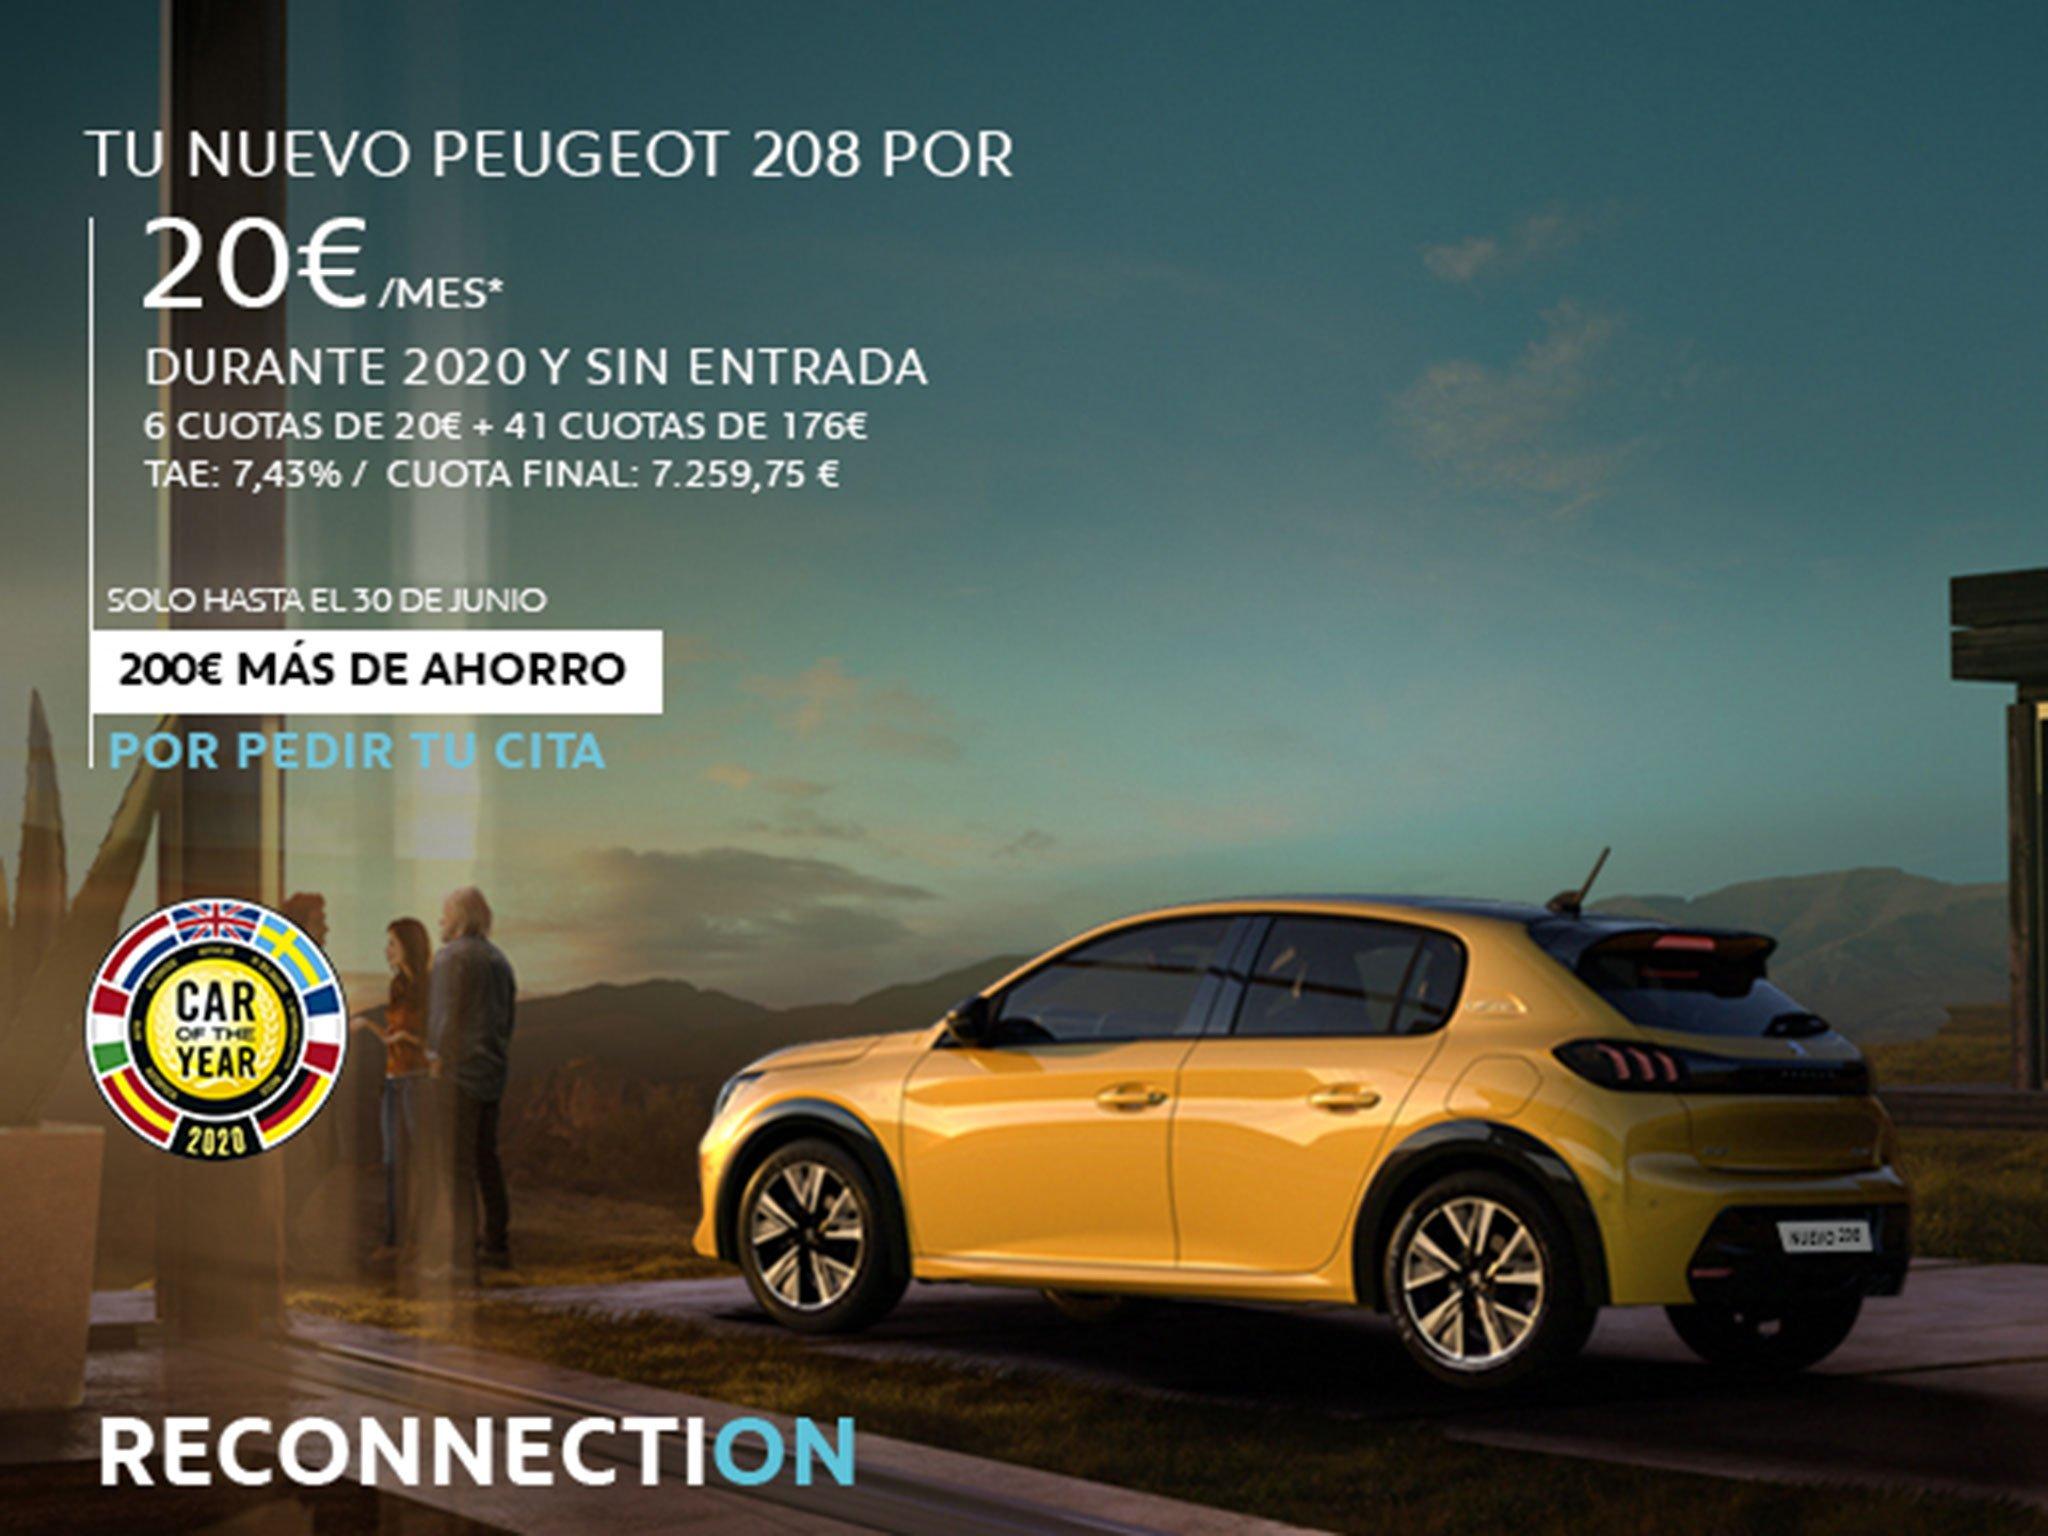 Nuevo Peugeot 208 con Reconnection – Peumóvil